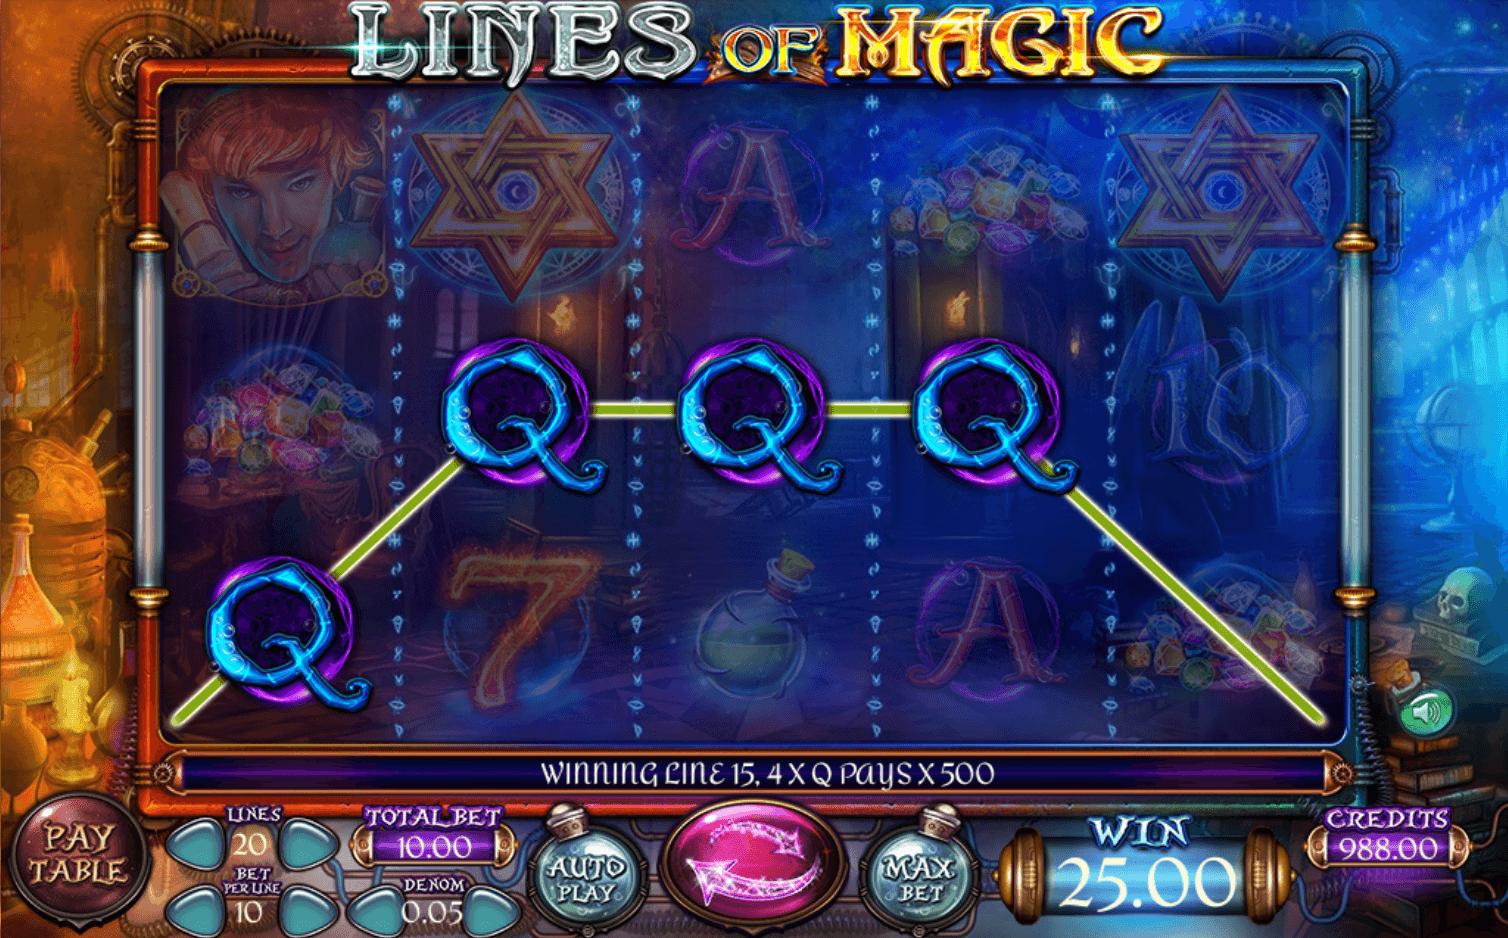 Spiele Lines Of Magic - Video Slots Online